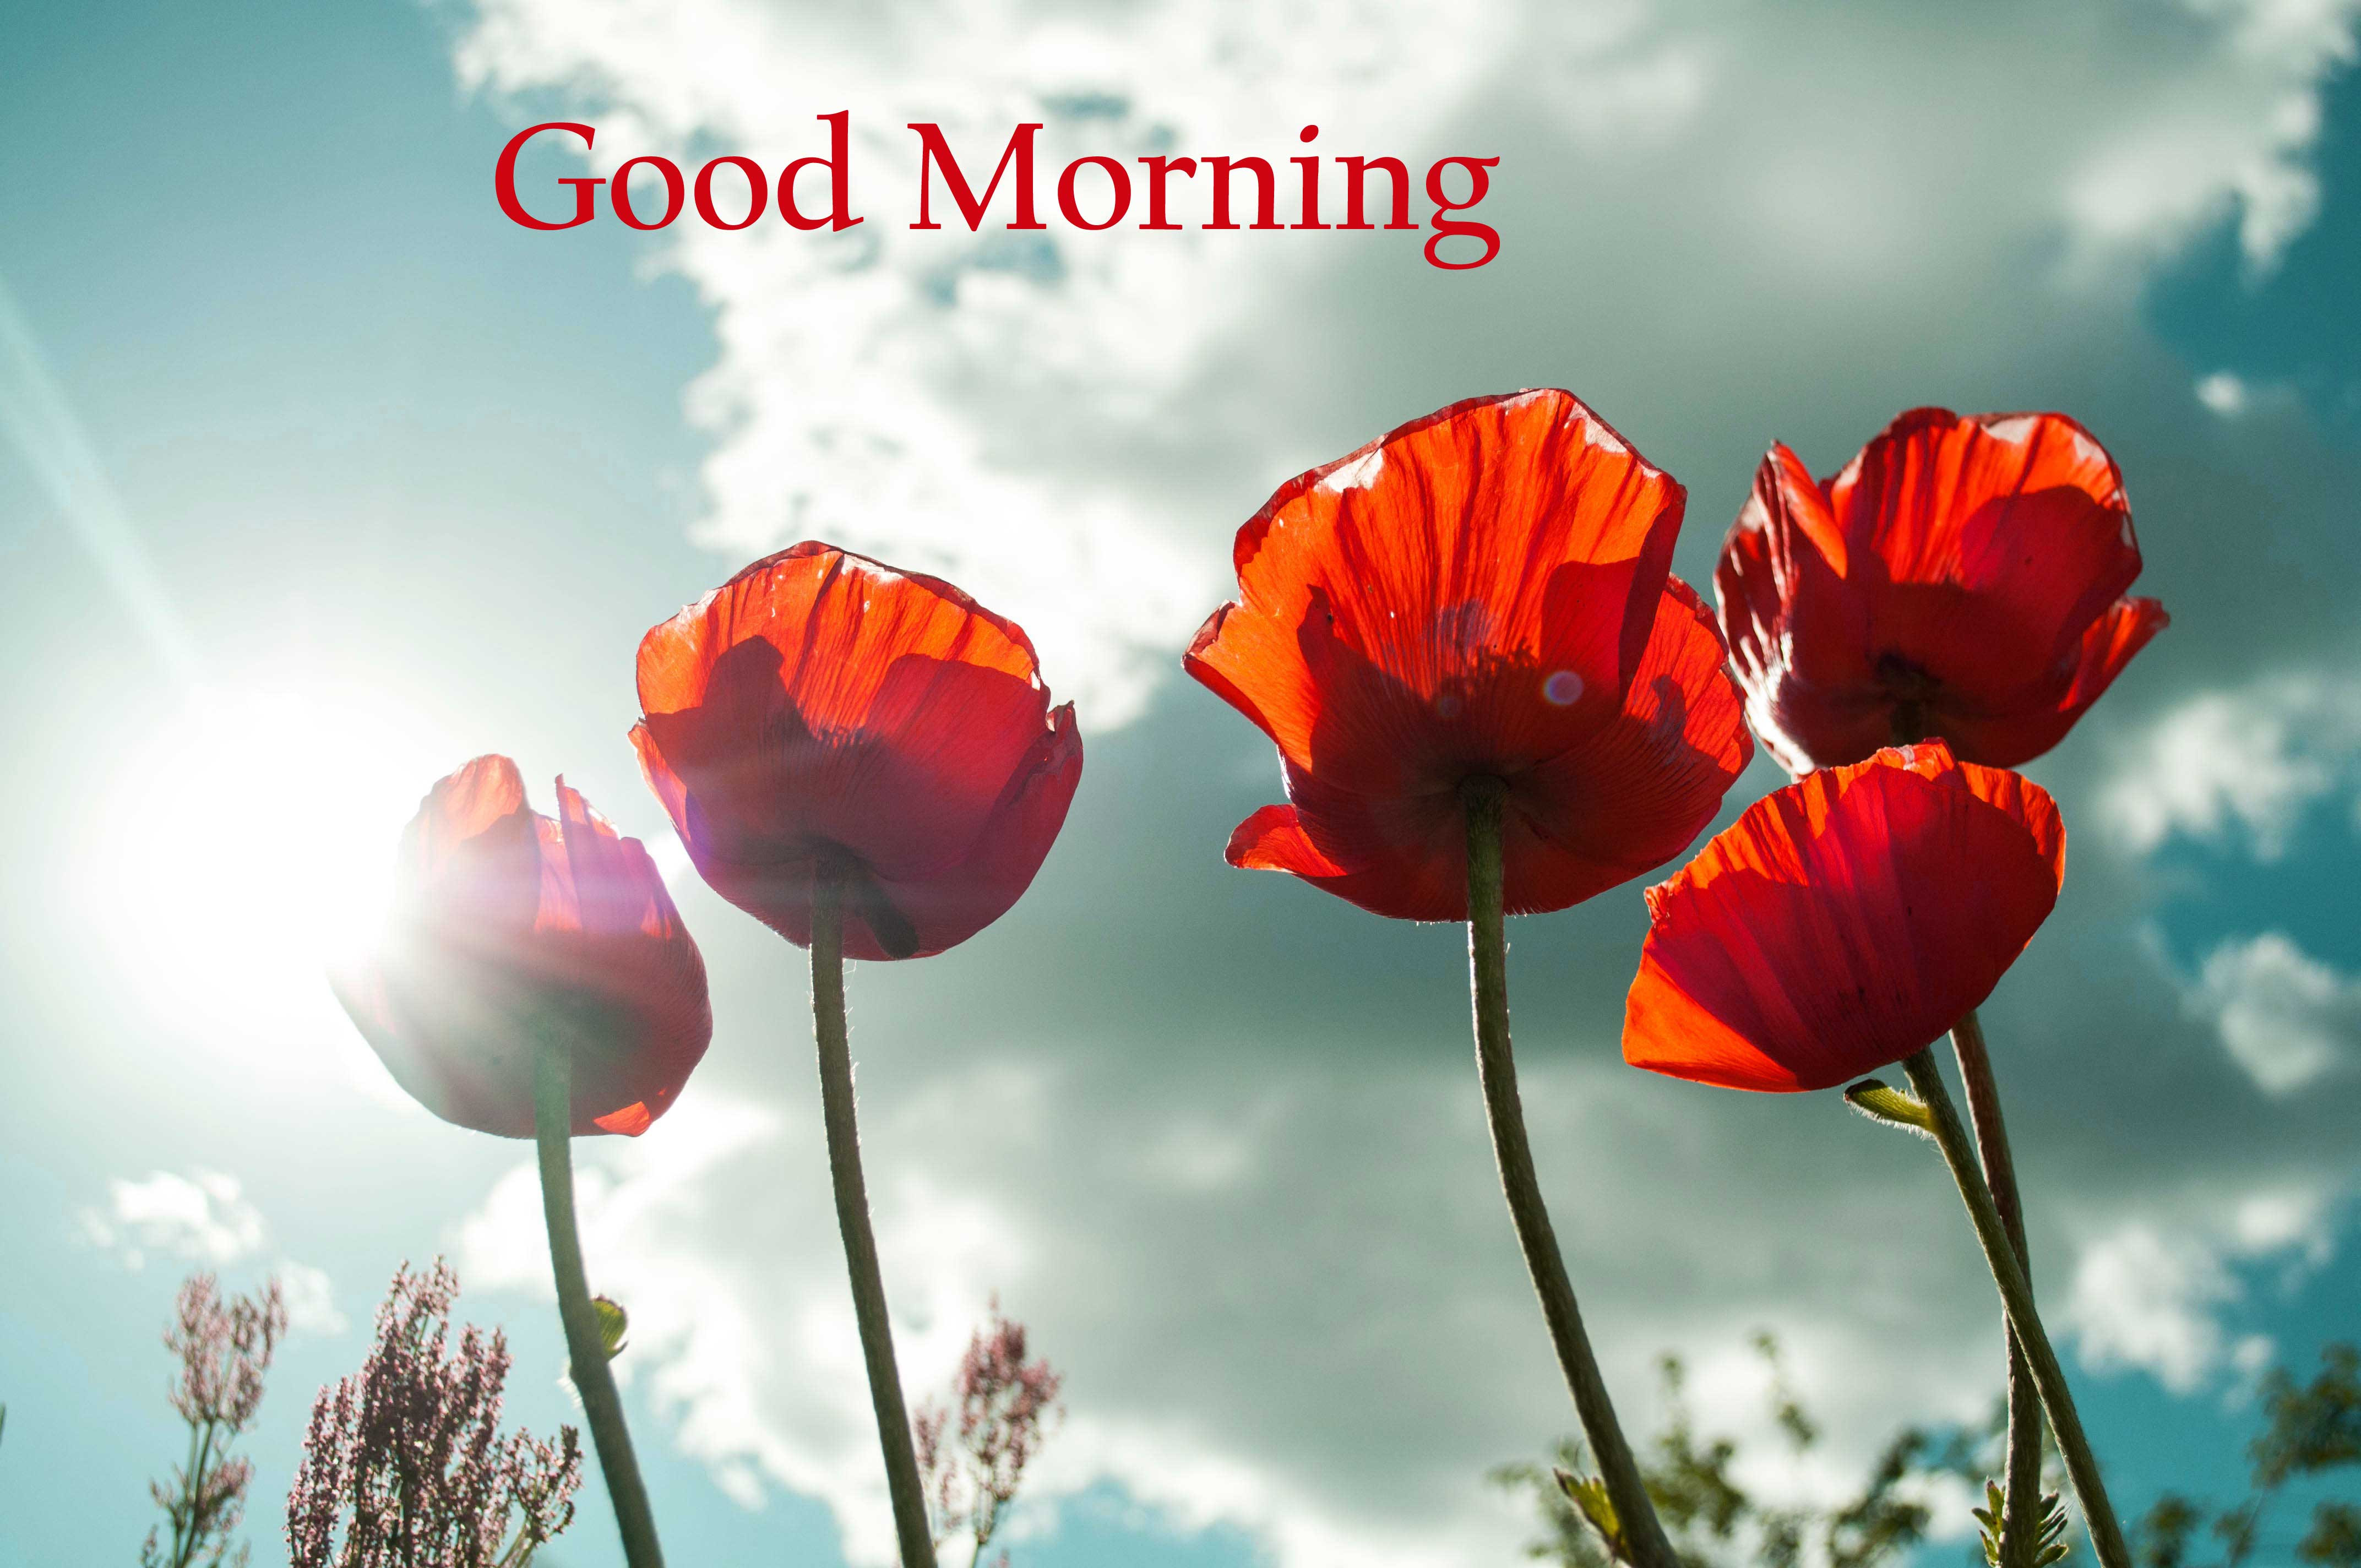 Best Flower Website Elegant 157 Good Morning Flowers S Pics Hd Download Here